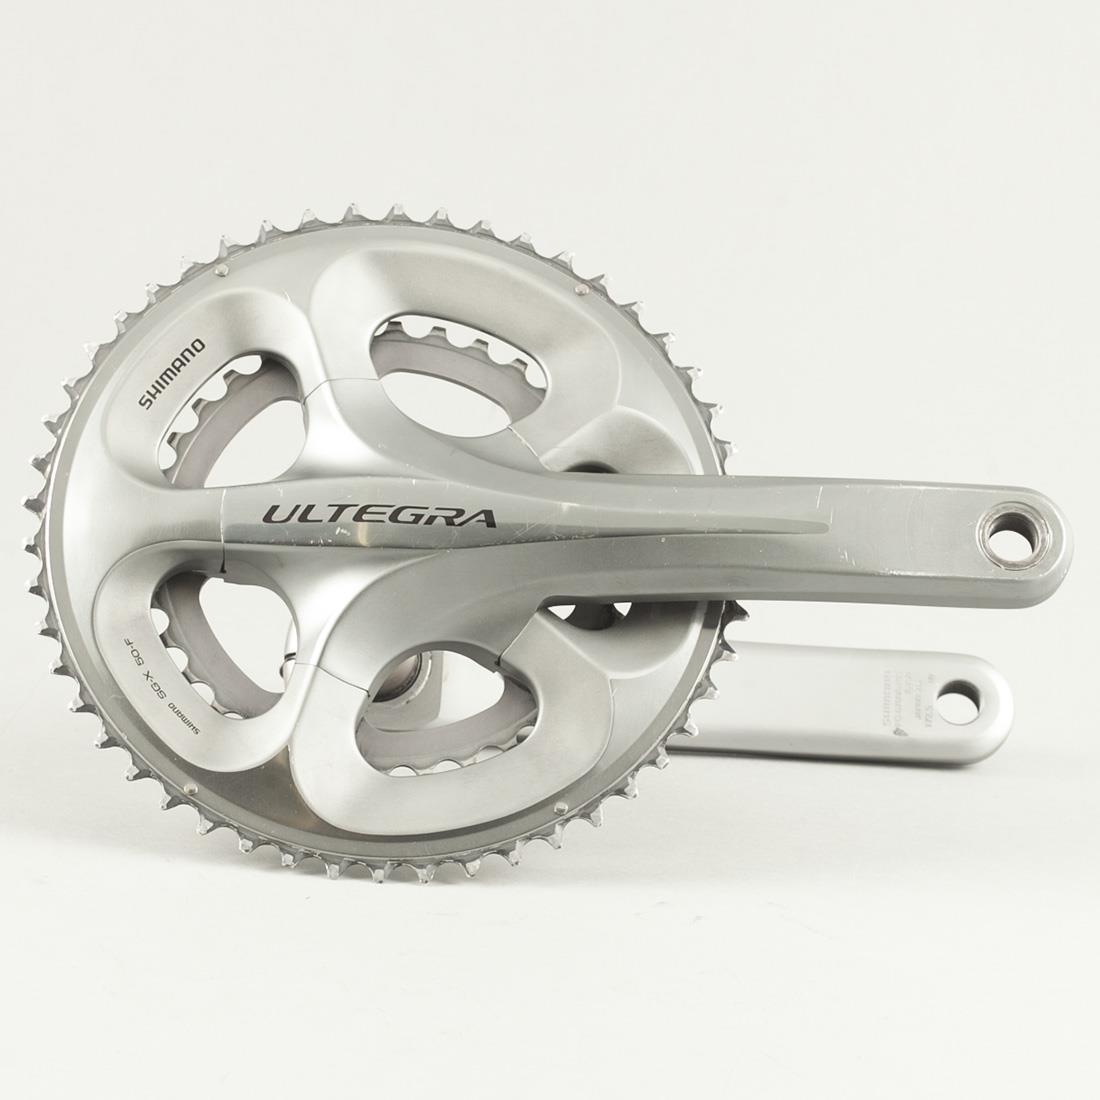 Used Shimano Ultegra FC-6750 Road Bike Compact Crankset 170mm 50/34t 9/10 Speed | eBay